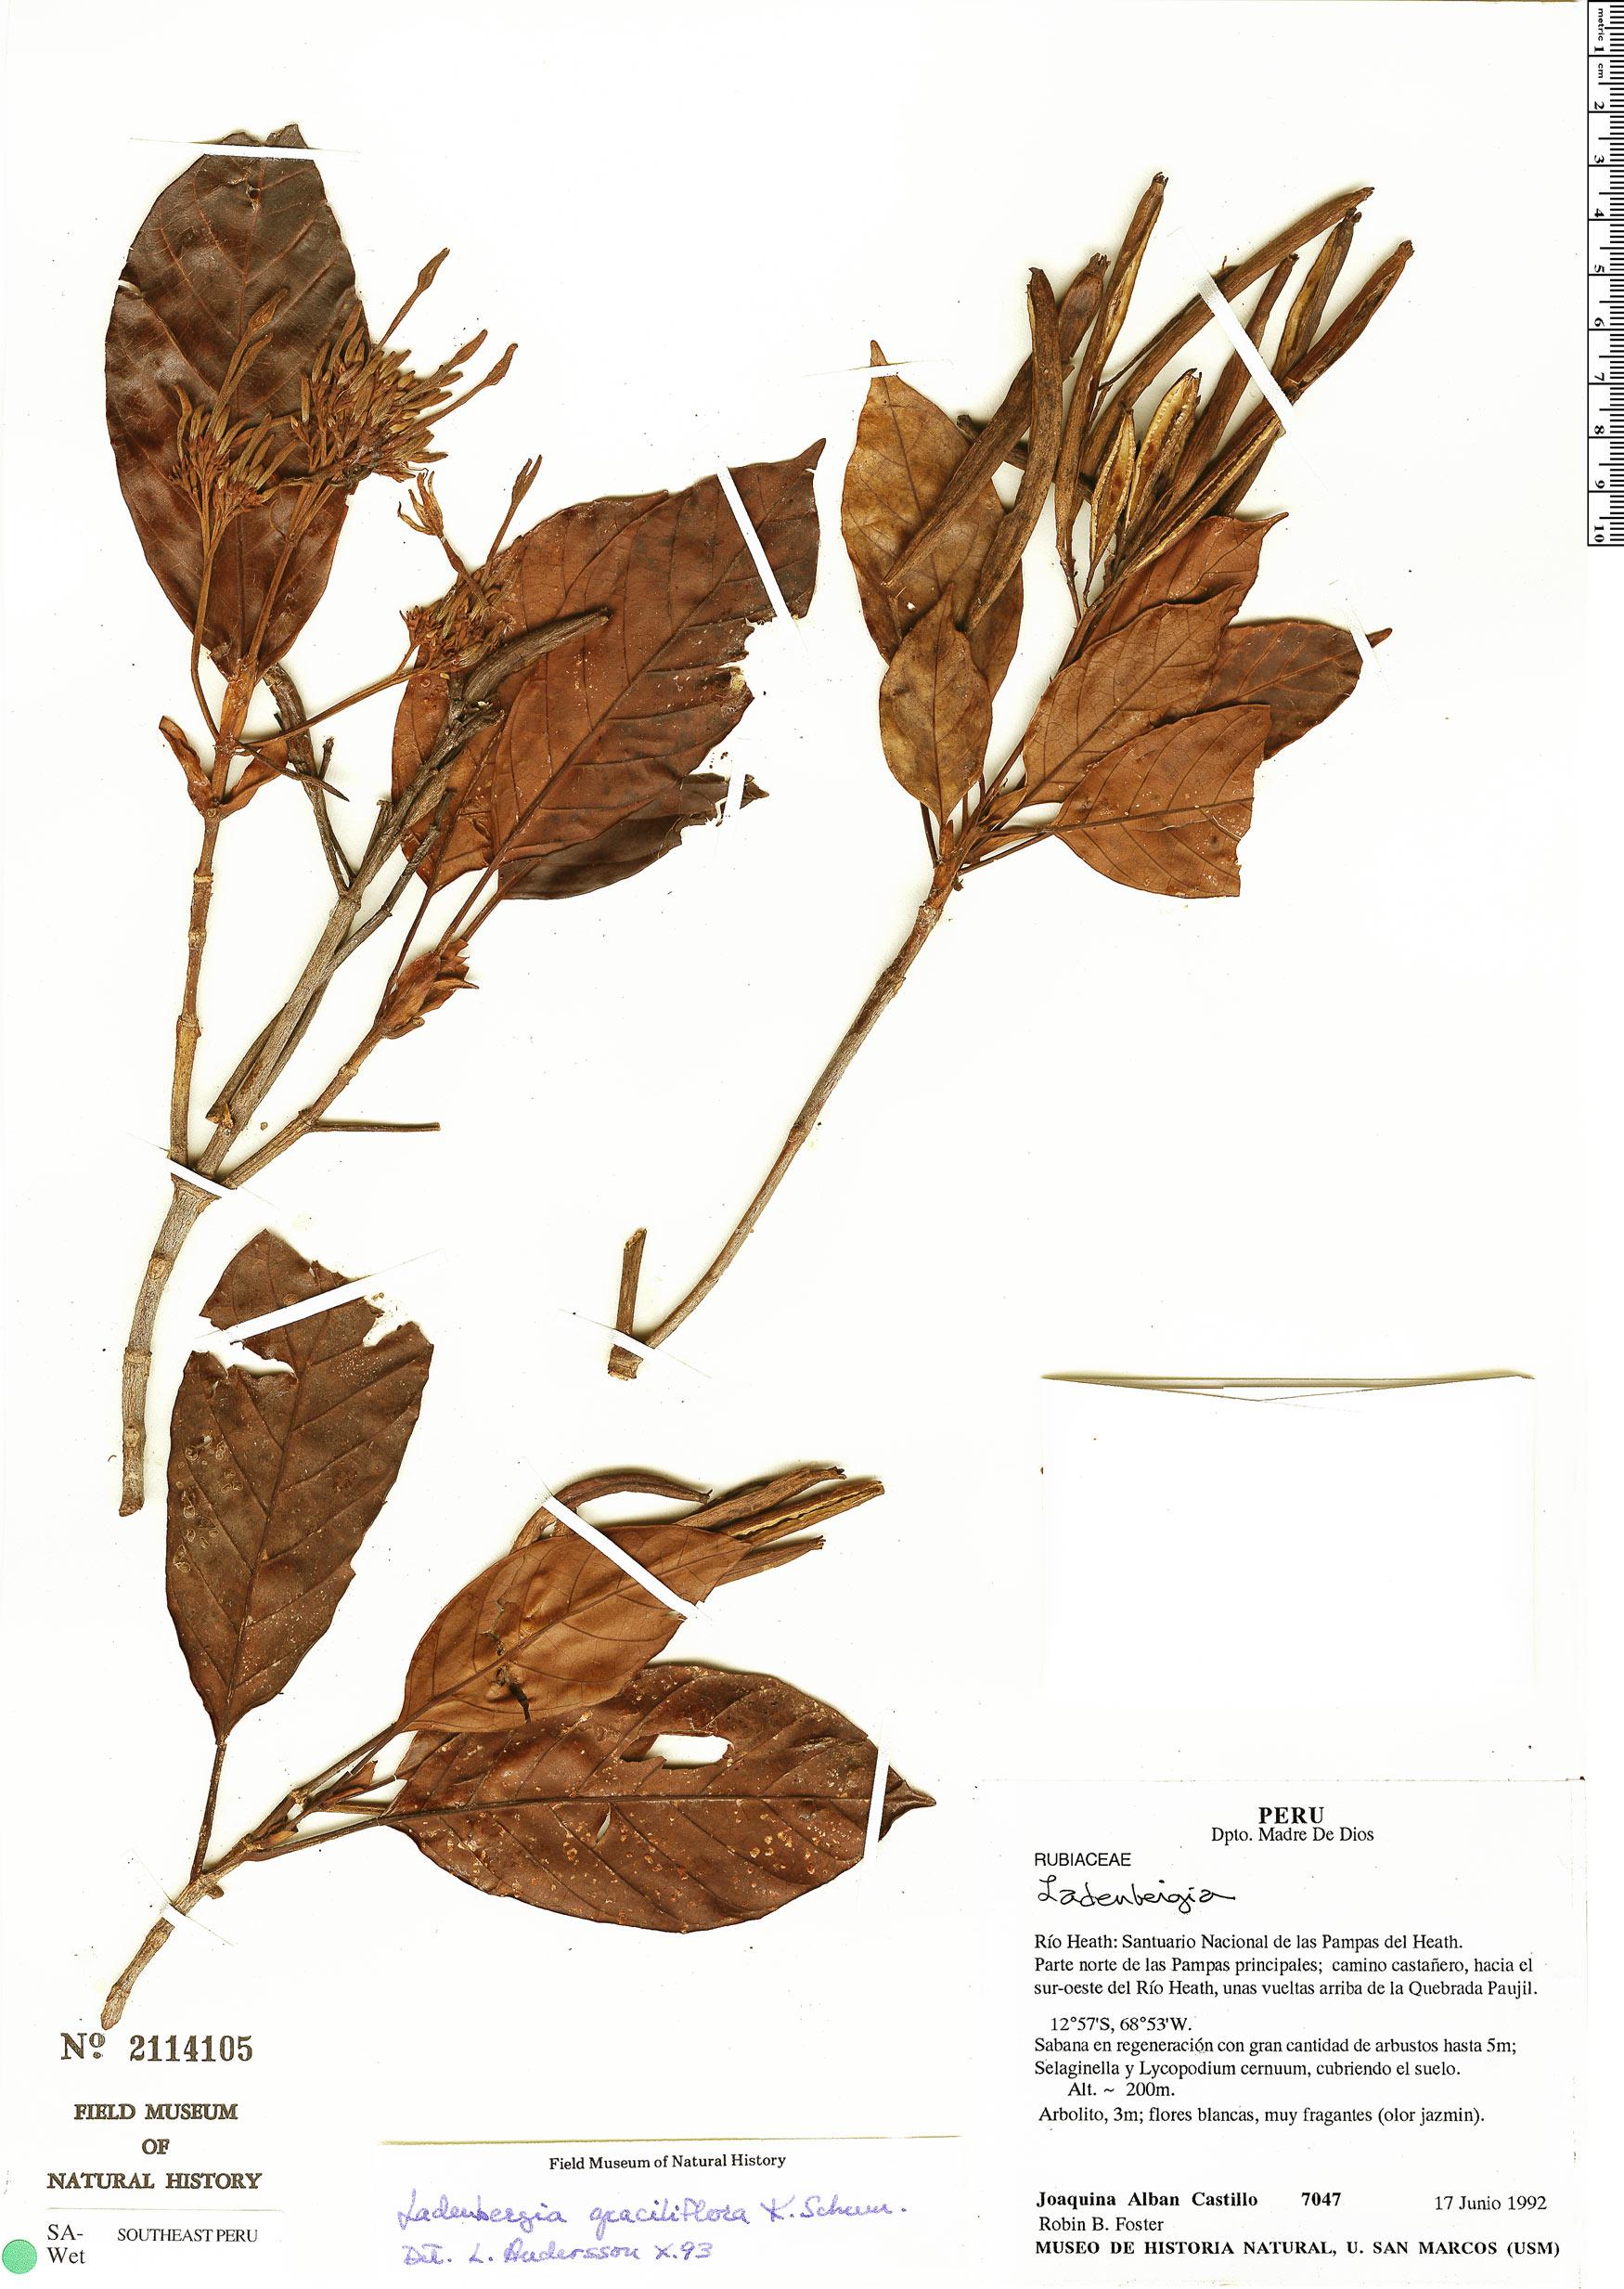 Specimen: Ladenbergia graciliflora